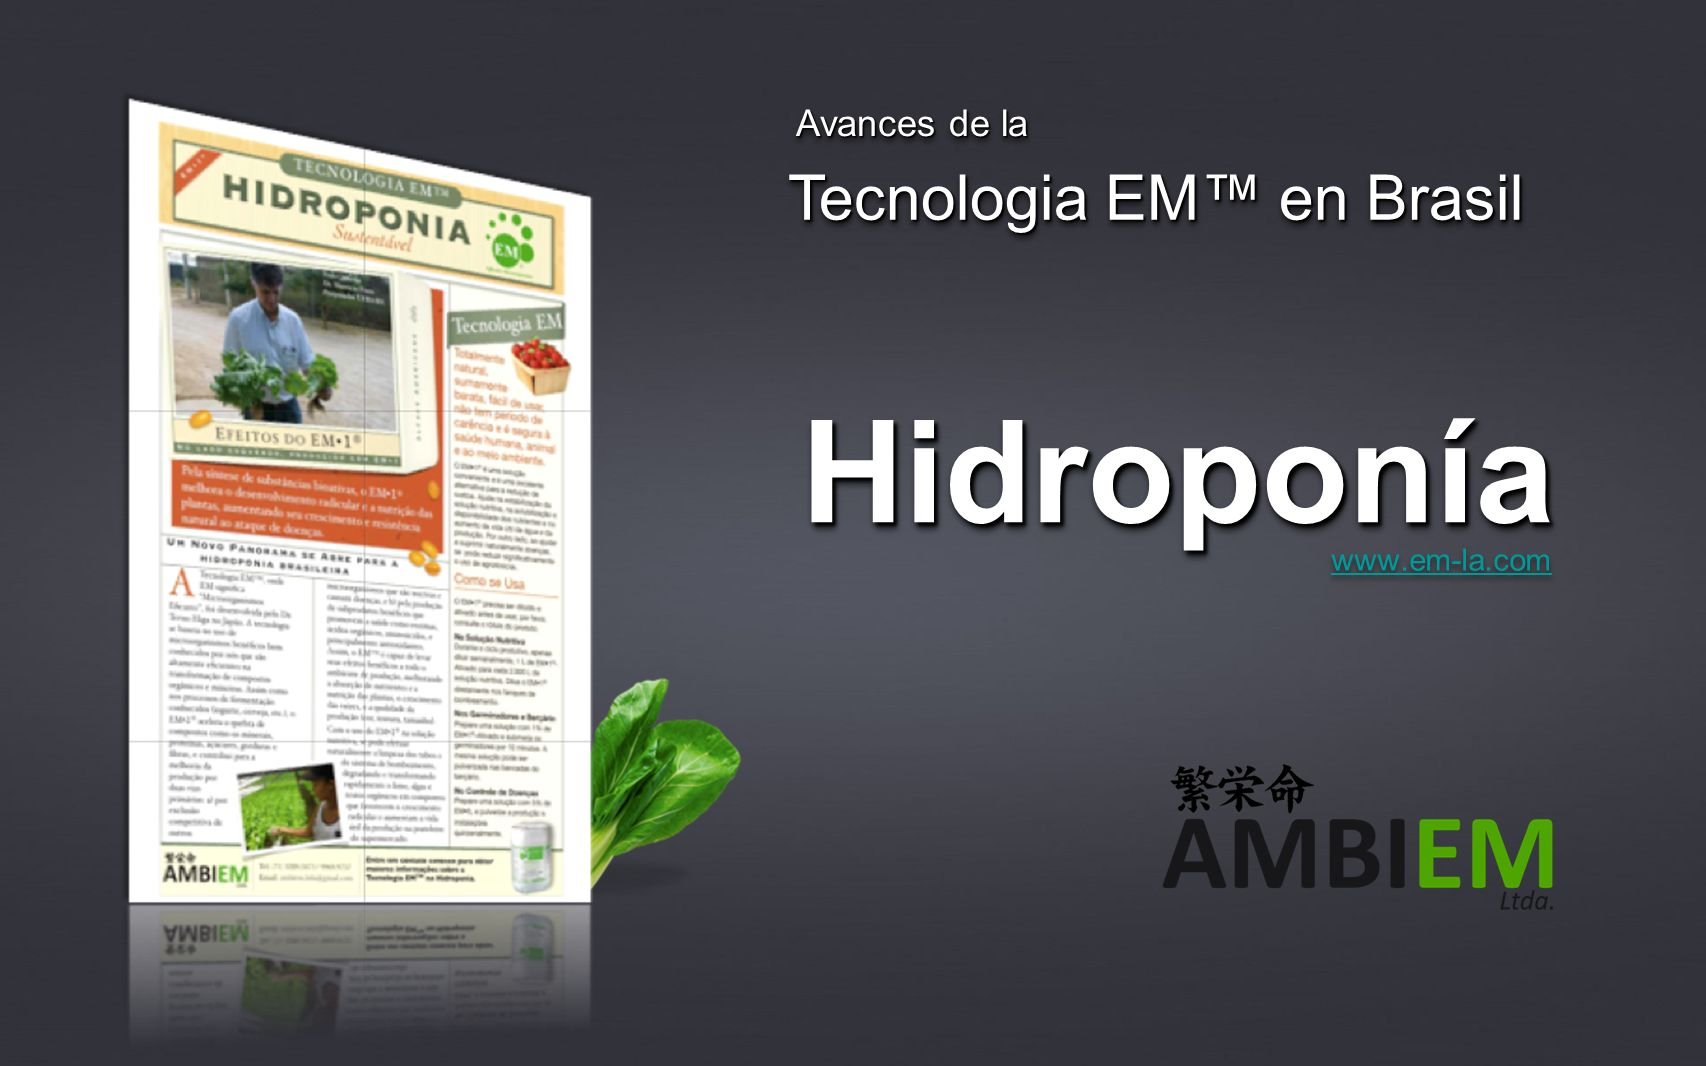 HidroponíaHidroponía www.em-la.com Avances de la Tecnologia EM en Brasil